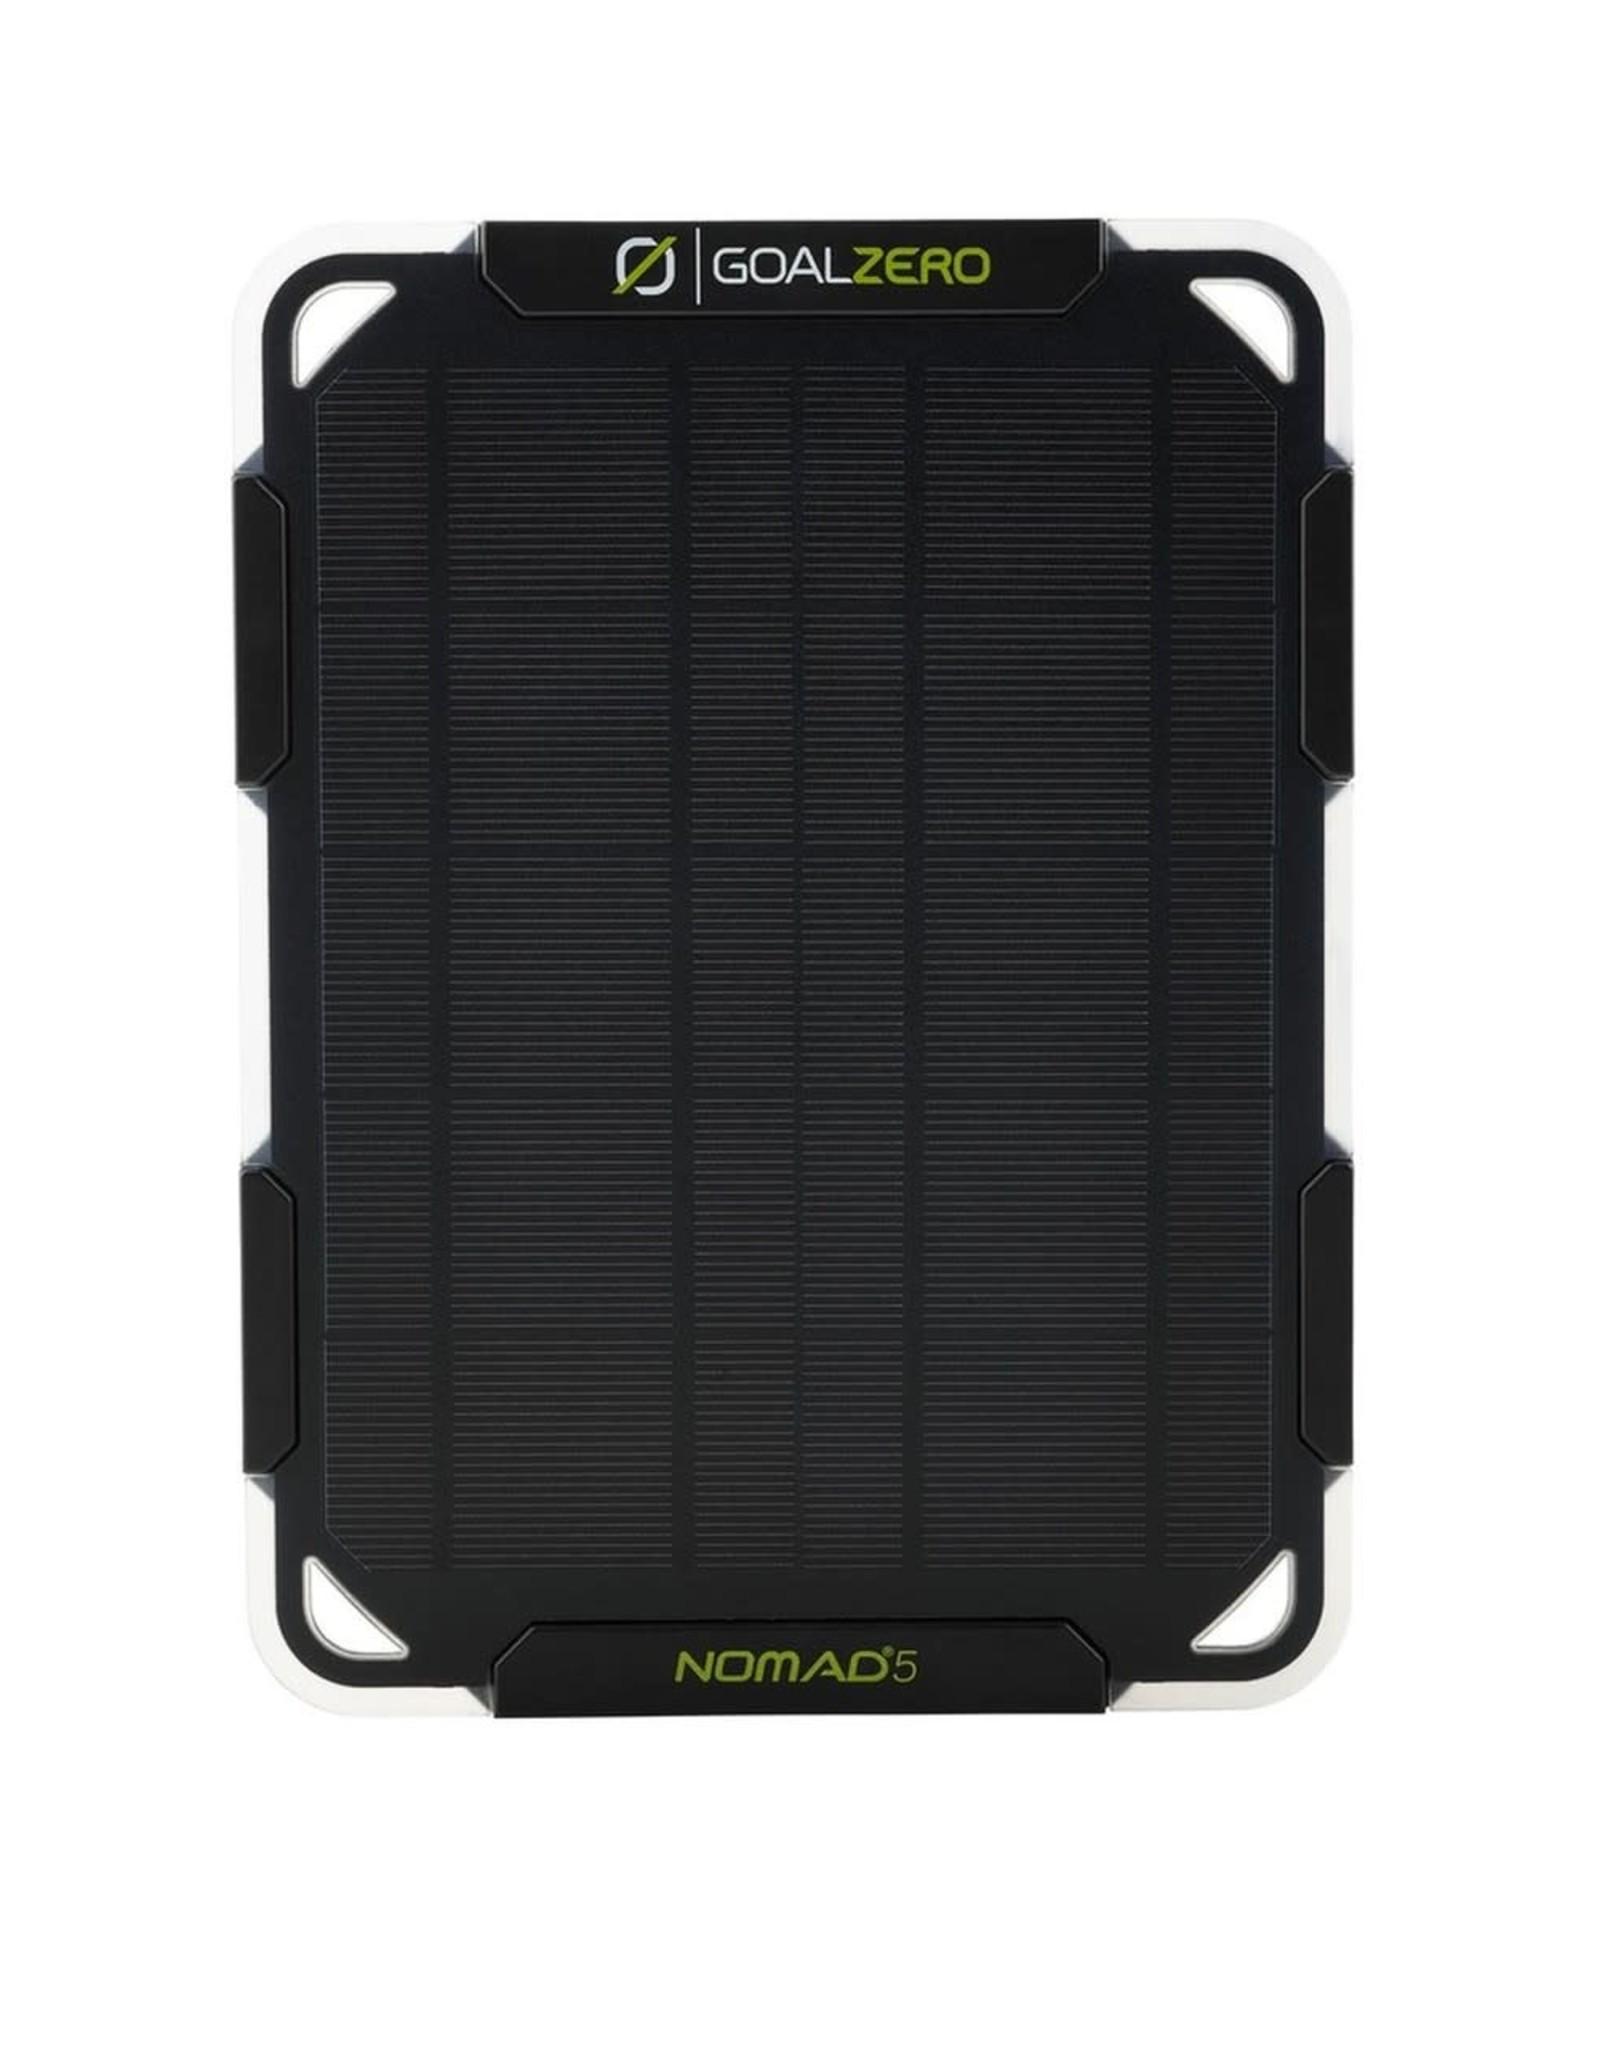 Goal Zero Goal Zero   Nomad 5 Solar Charger 11500